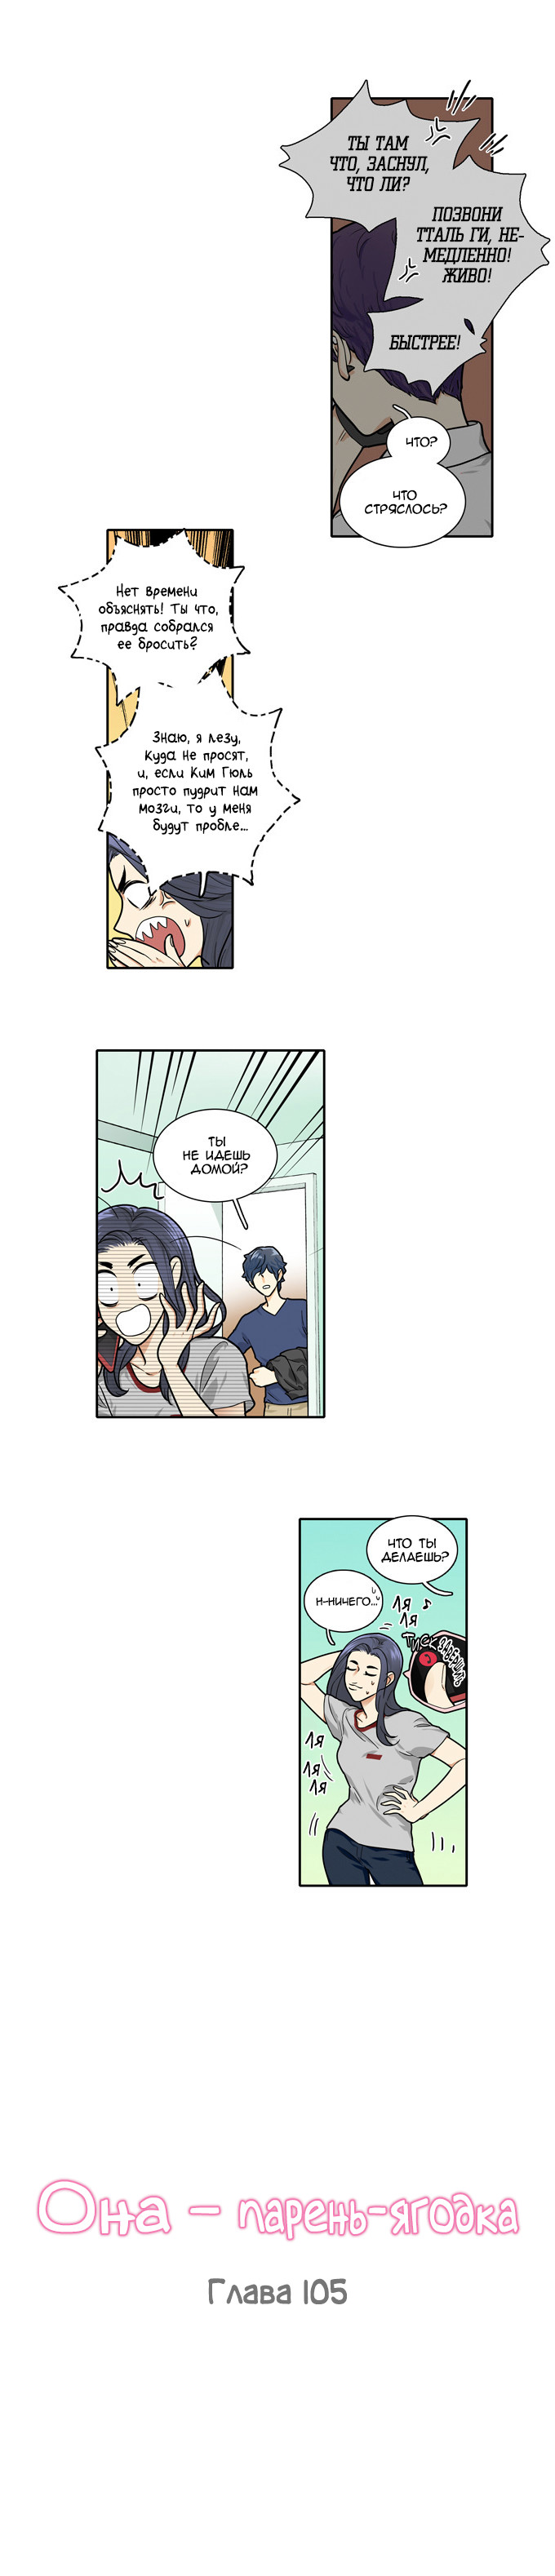 https://r1.ninemanga.com/comics/pic2/41/21609/314354/1481656513784.jpg Page 3